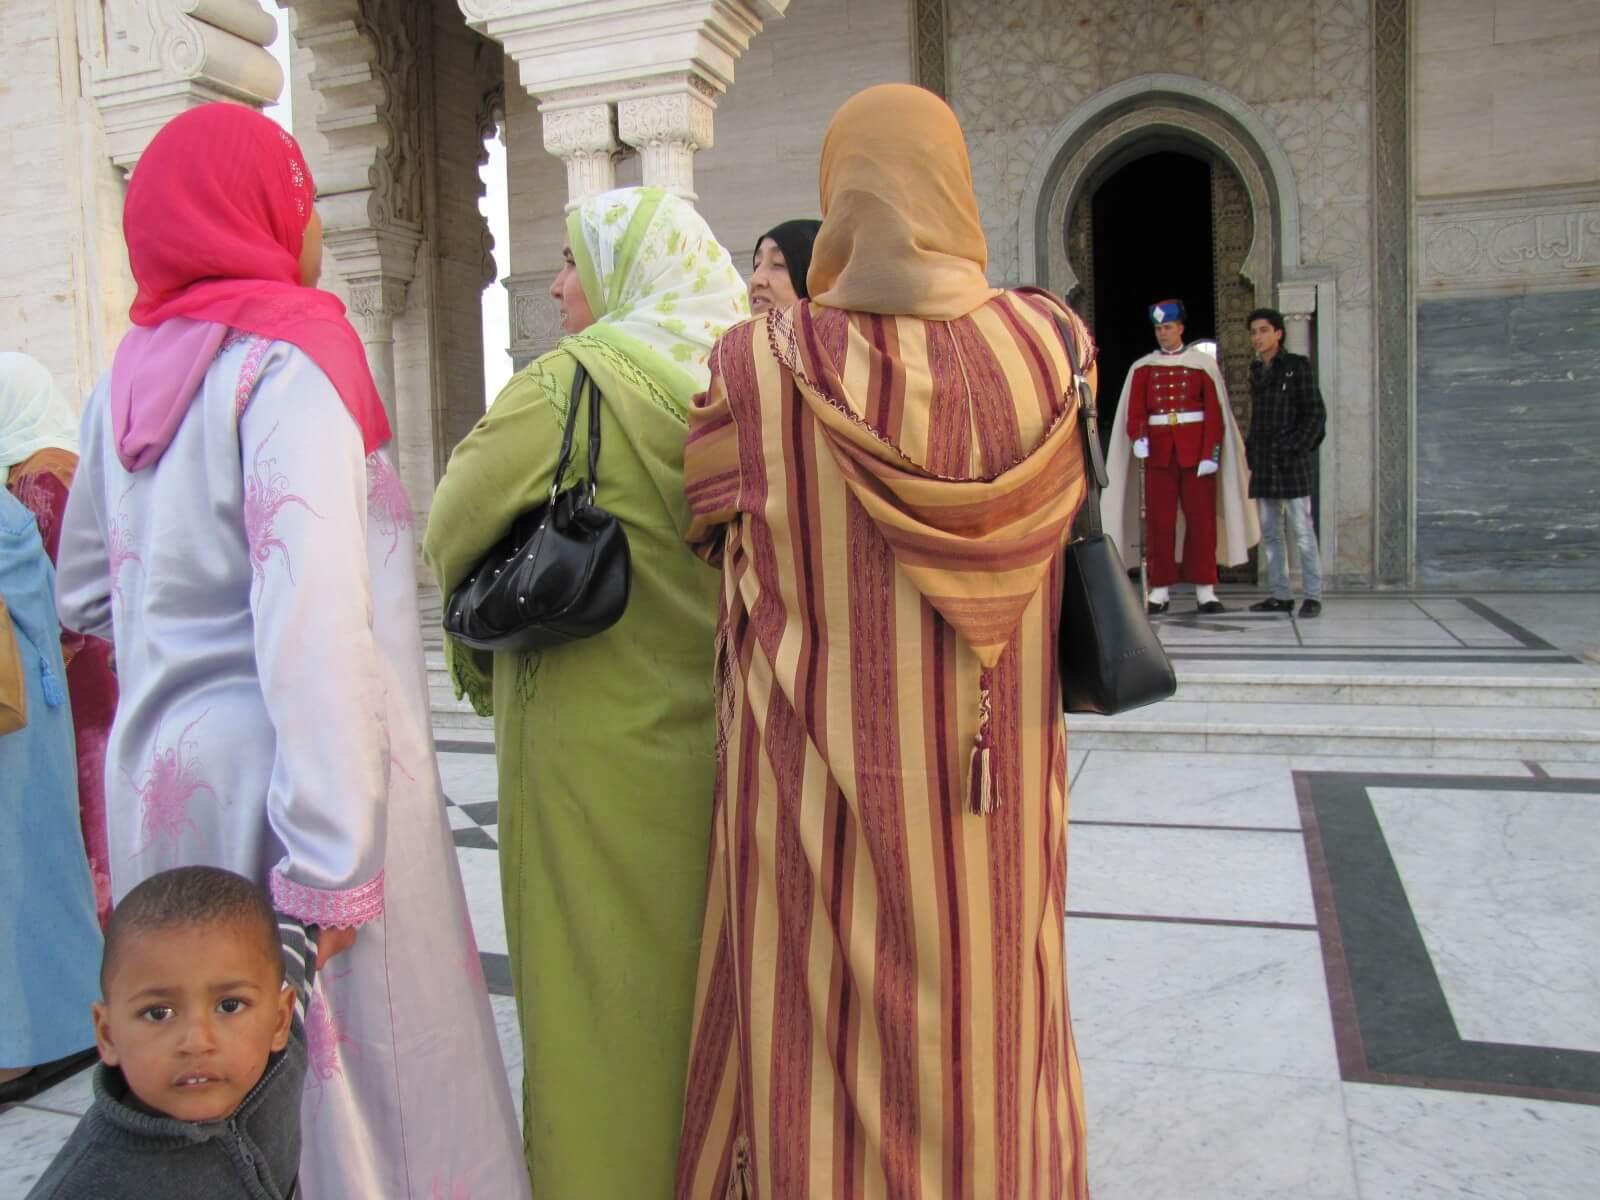 Dress code in Islamic countries, Morocco